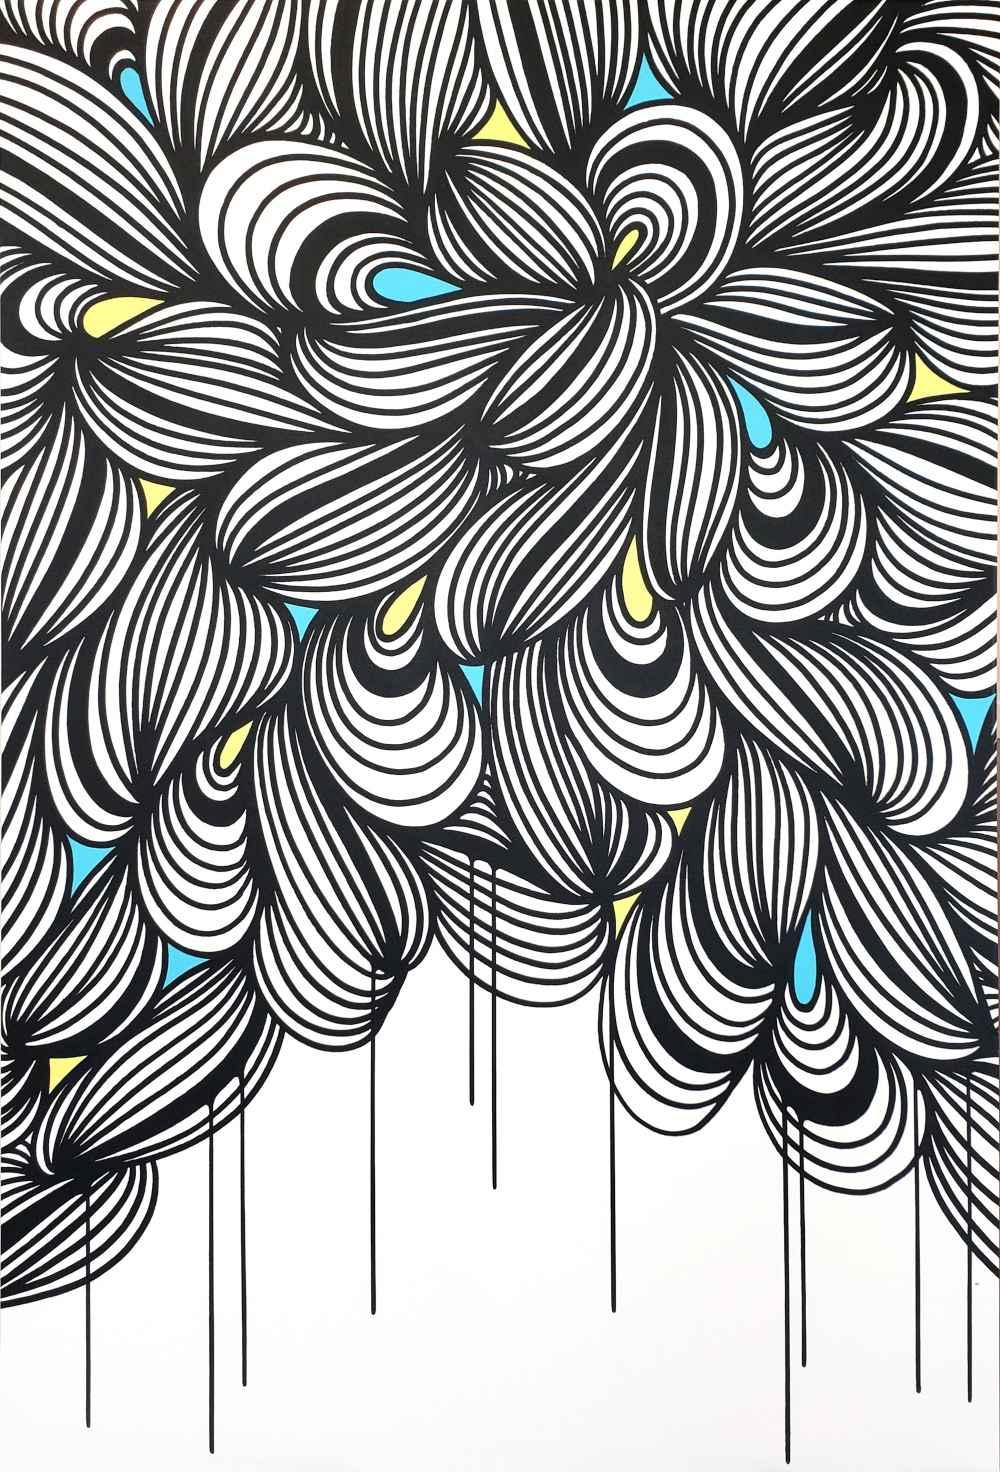 Unwavering Joy #3 by   Kef! Originals - Masterpiece Online